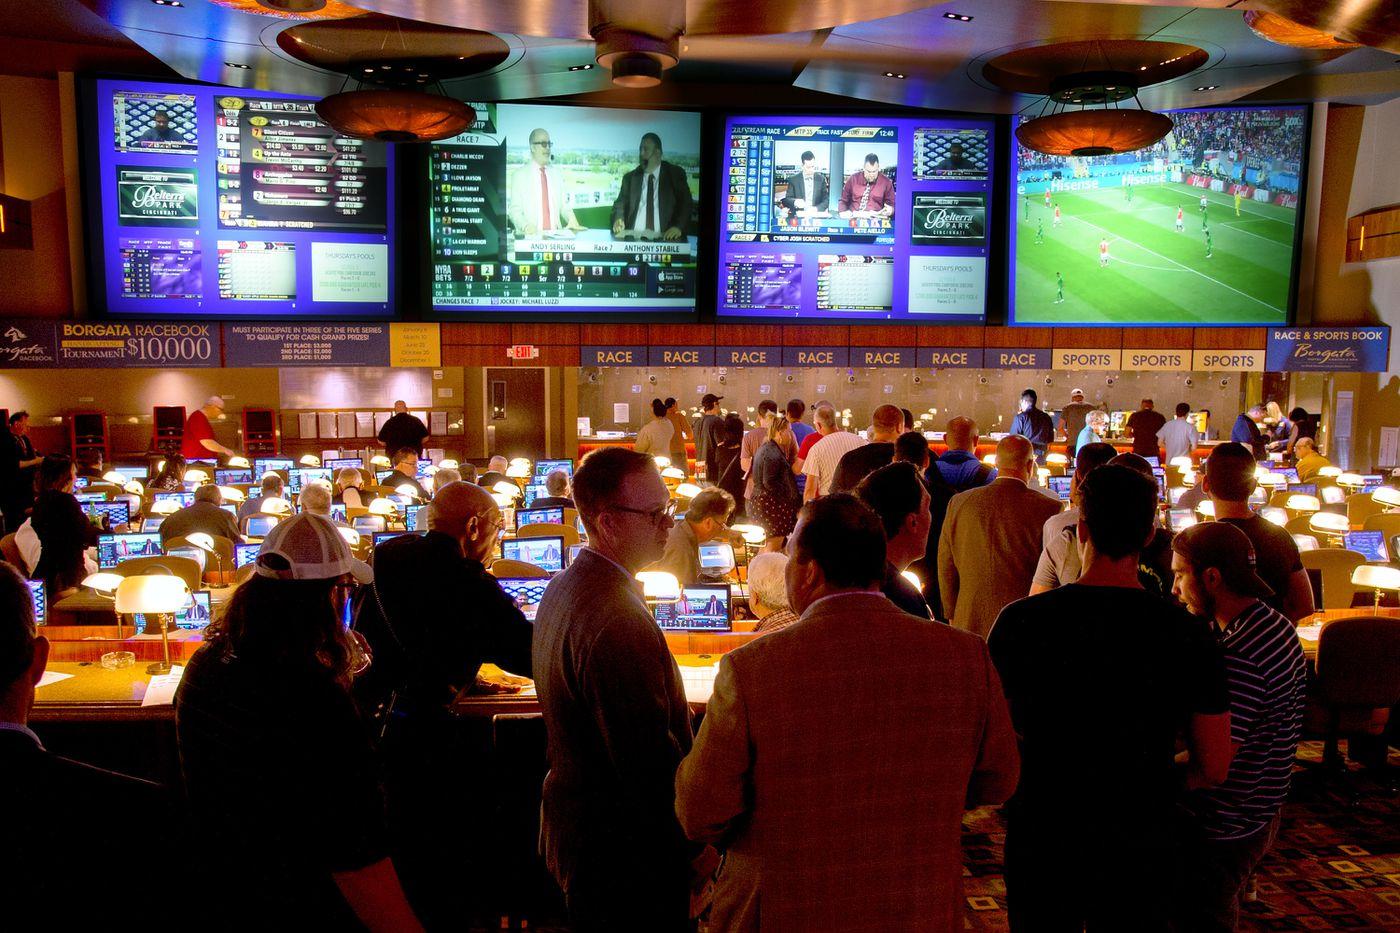 N.J.'s sports betting generates $294K in taxes